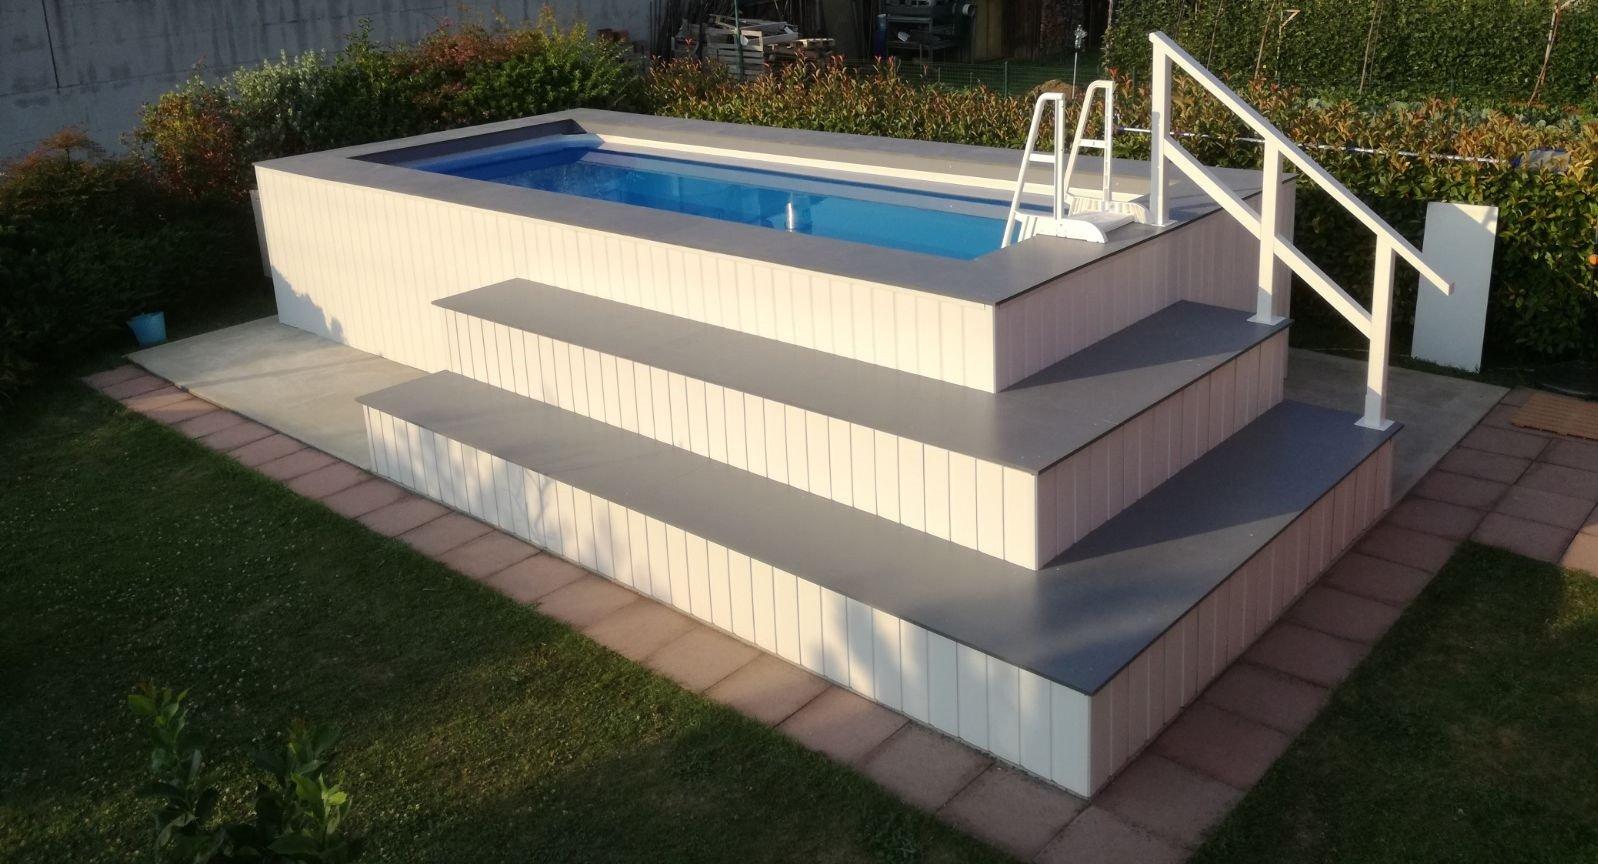 Piscina fuori terra rivestita in wpc personalizzata - Rivestire piscina fuori terra fai da te ...